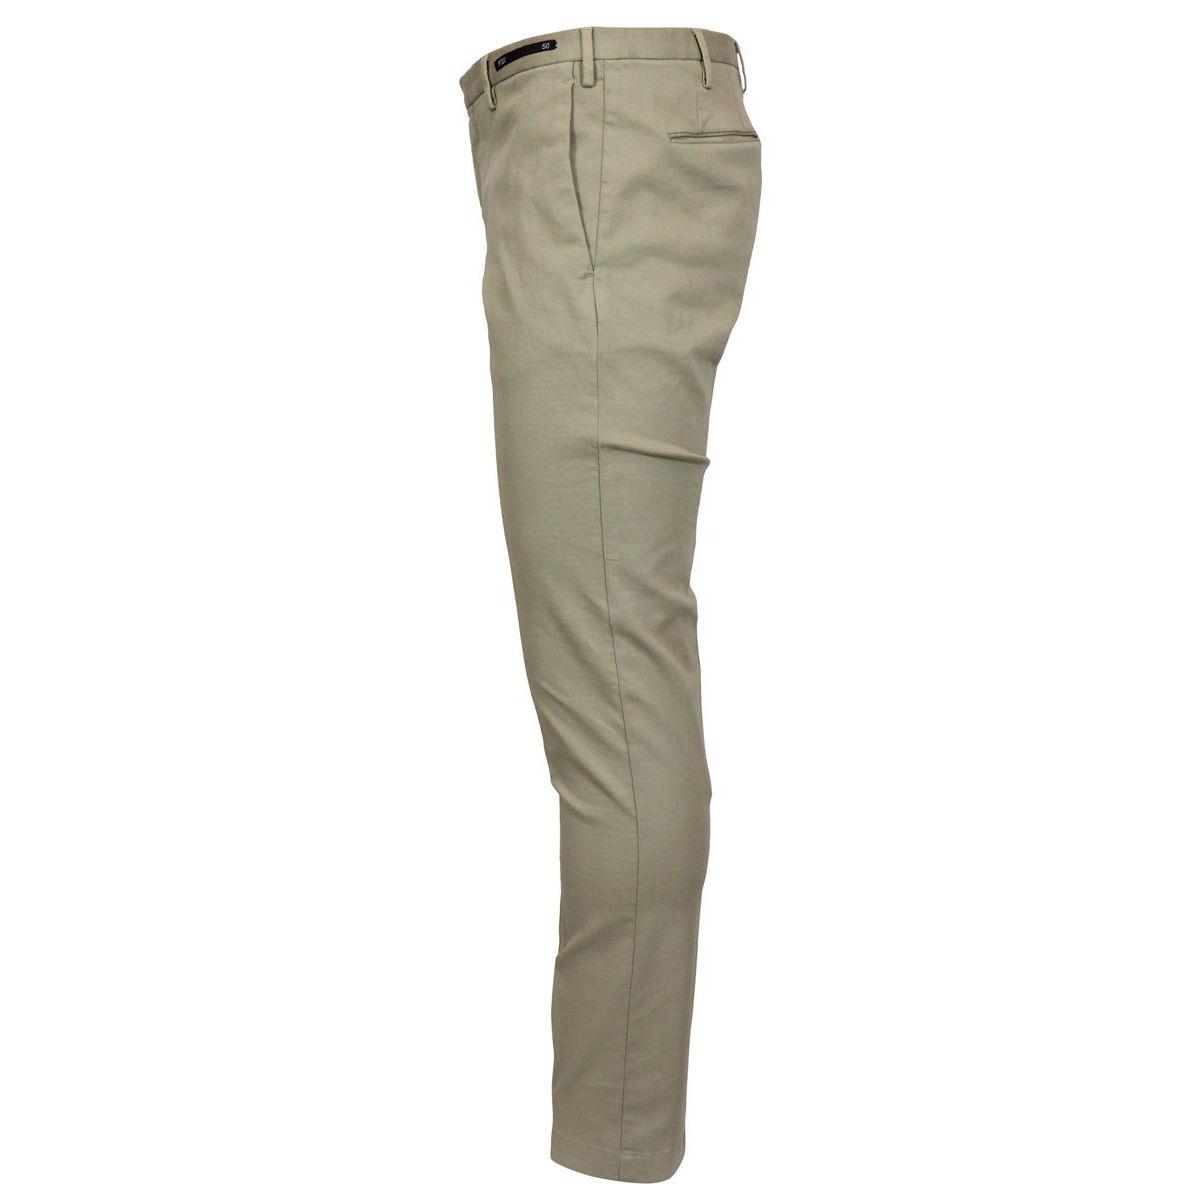 Solid color cotton skinny pants Beige PT01